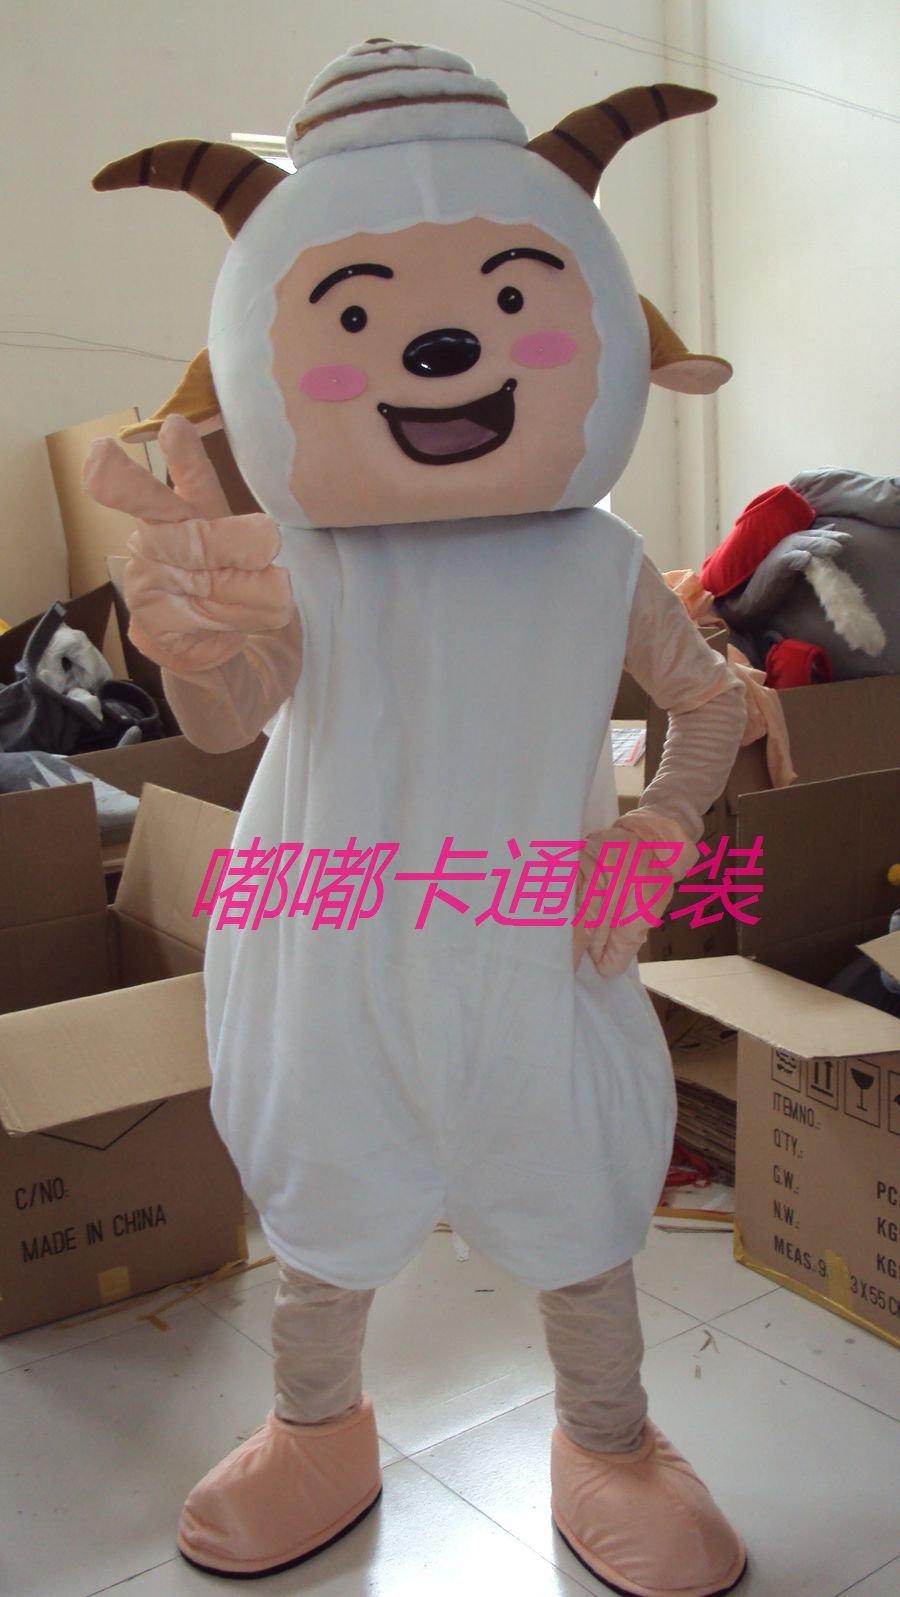 Lazy Walking Cartoon Doll Clothing Cartoon Dolls Cartoon Doll Cartoon Costumes Performing Apparel Mascot Costume